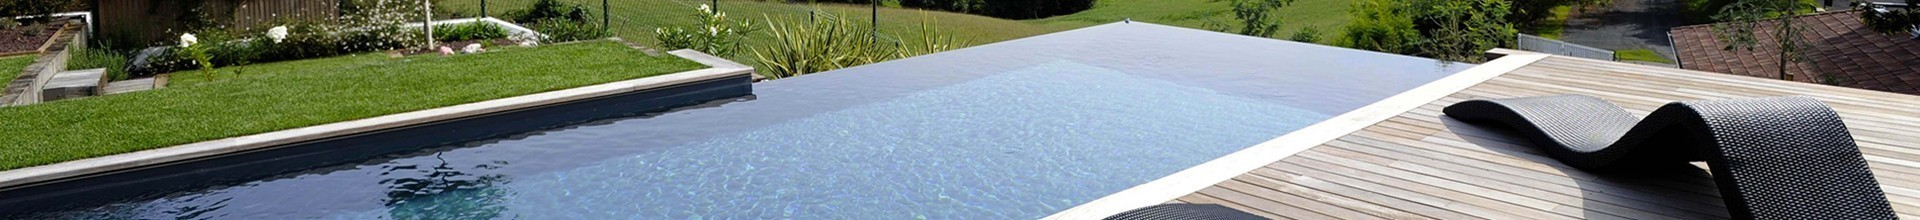 Direct usine, piscine coque prix Haute Loire